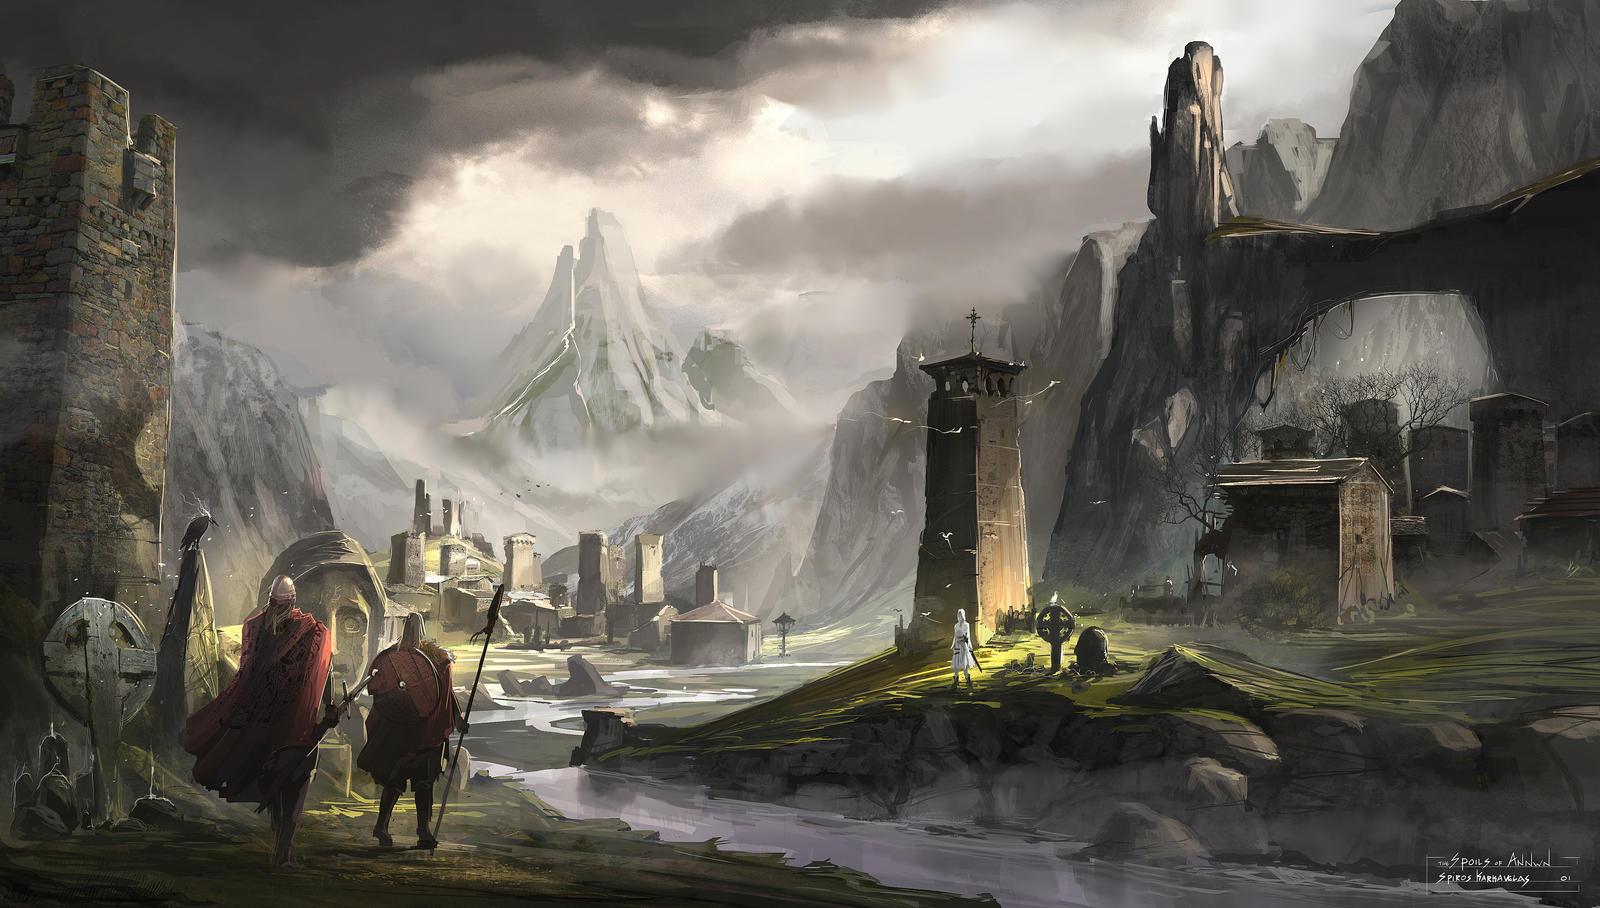 Viking underworld by Aisxos